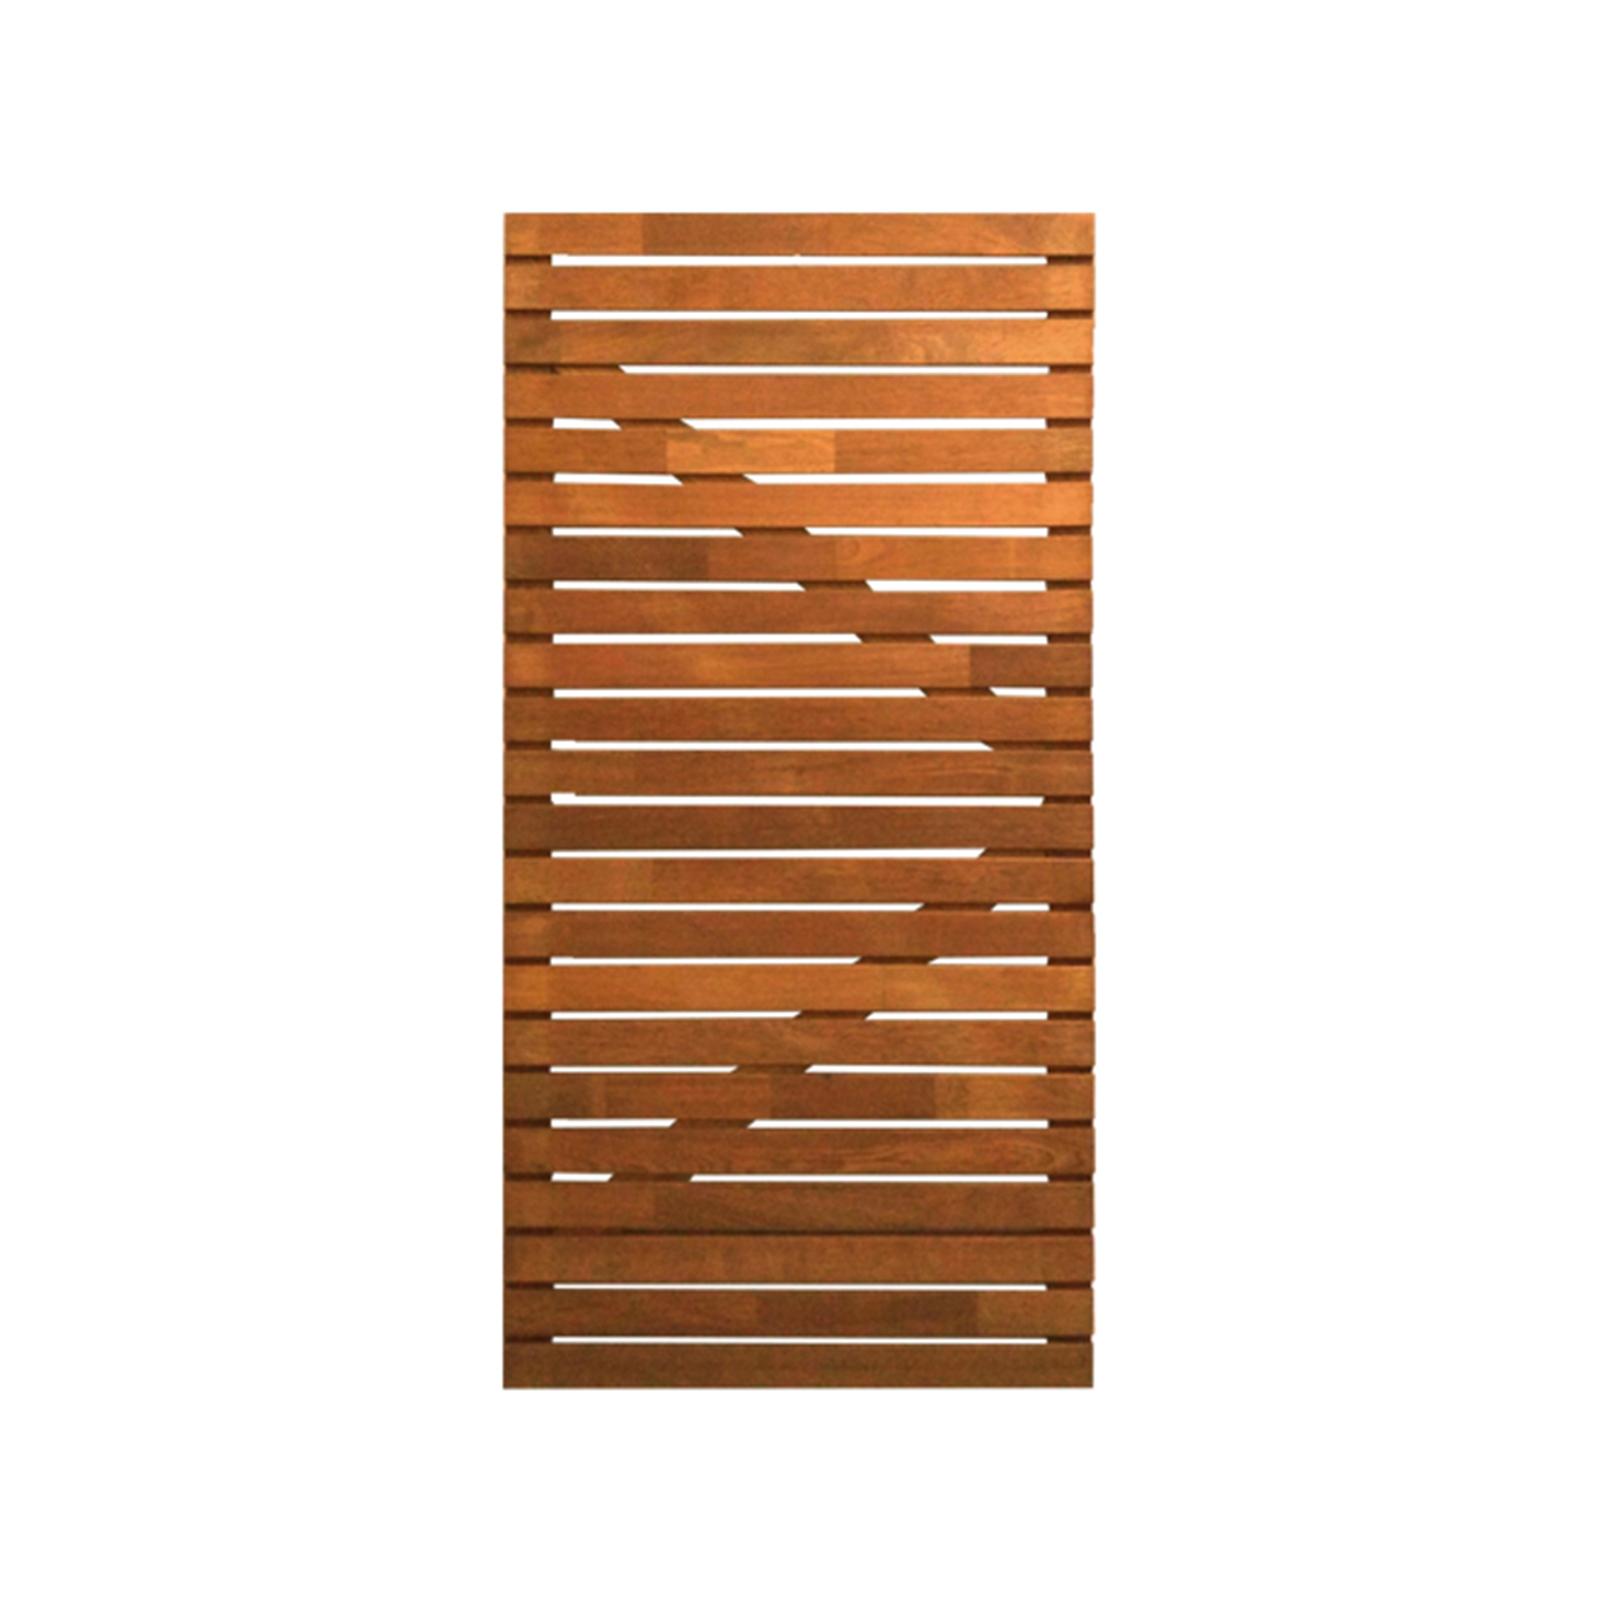 SpecRite 1833 x 900mm Merbau Pre-Oiled Horizontal Slat Gate